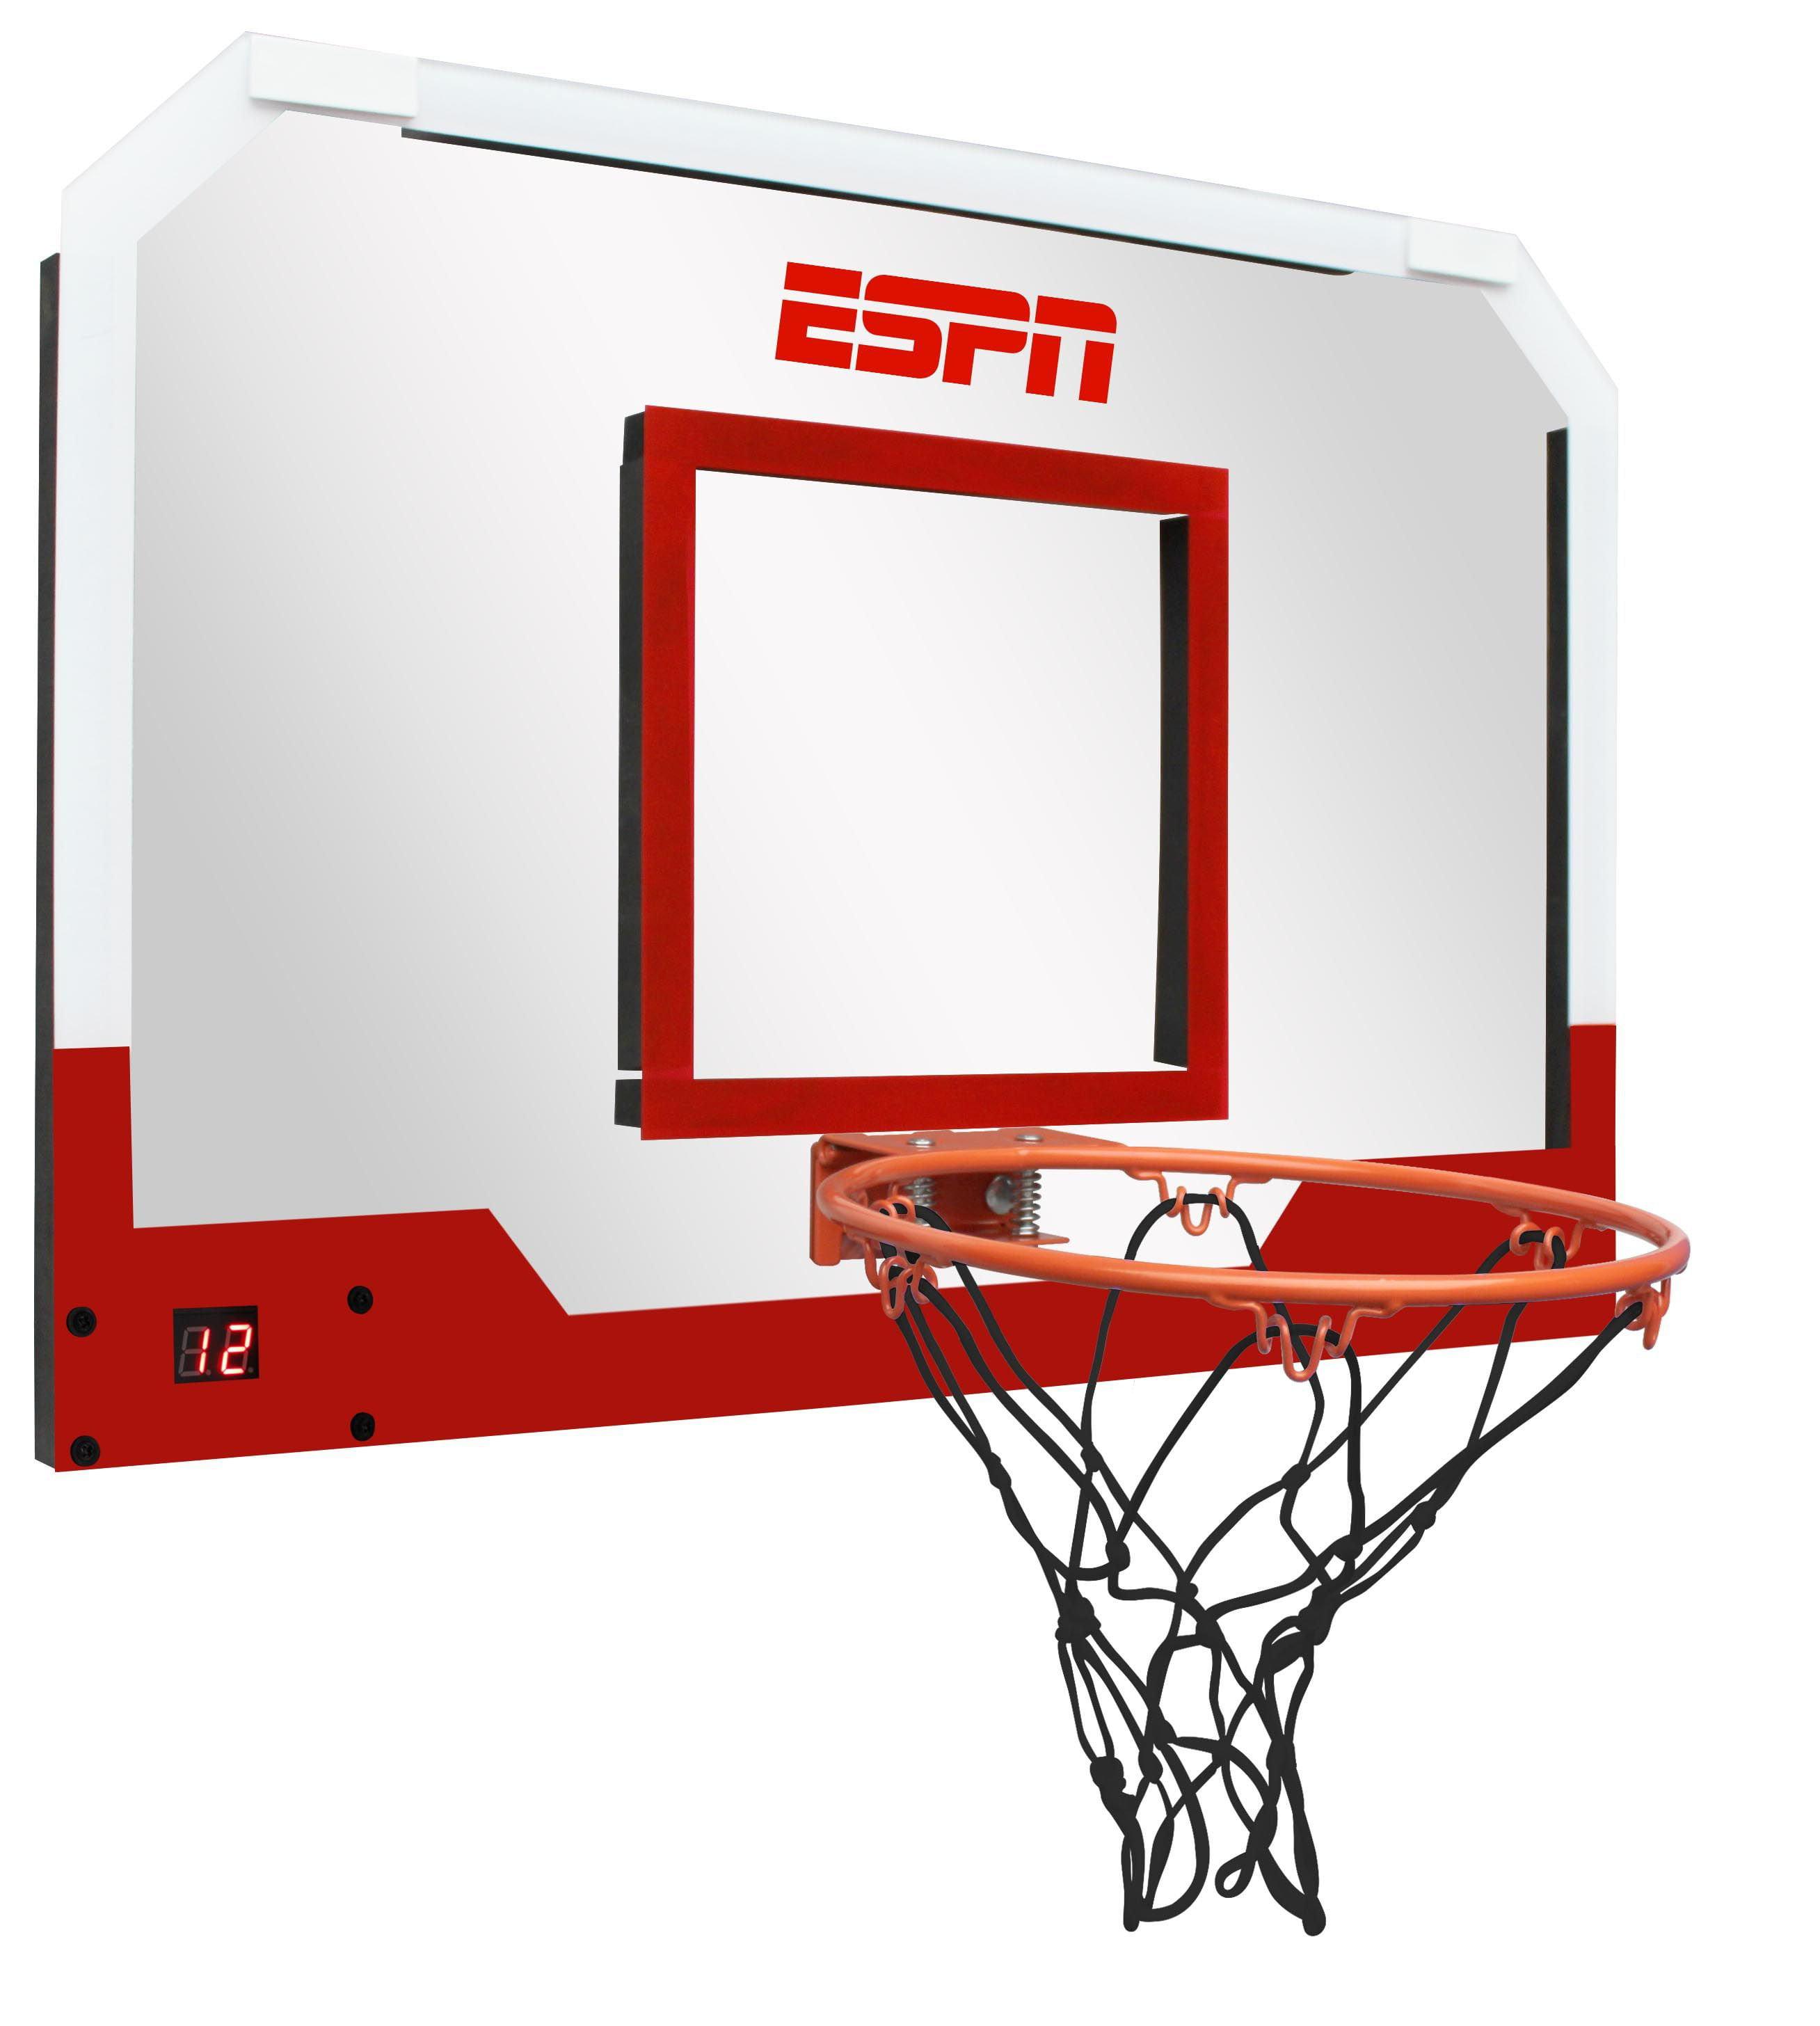 Charmant Medal Sports ESPN Pro Basketball Door Hoop With LED Electronic Scoring |  1451803   Walmart.com